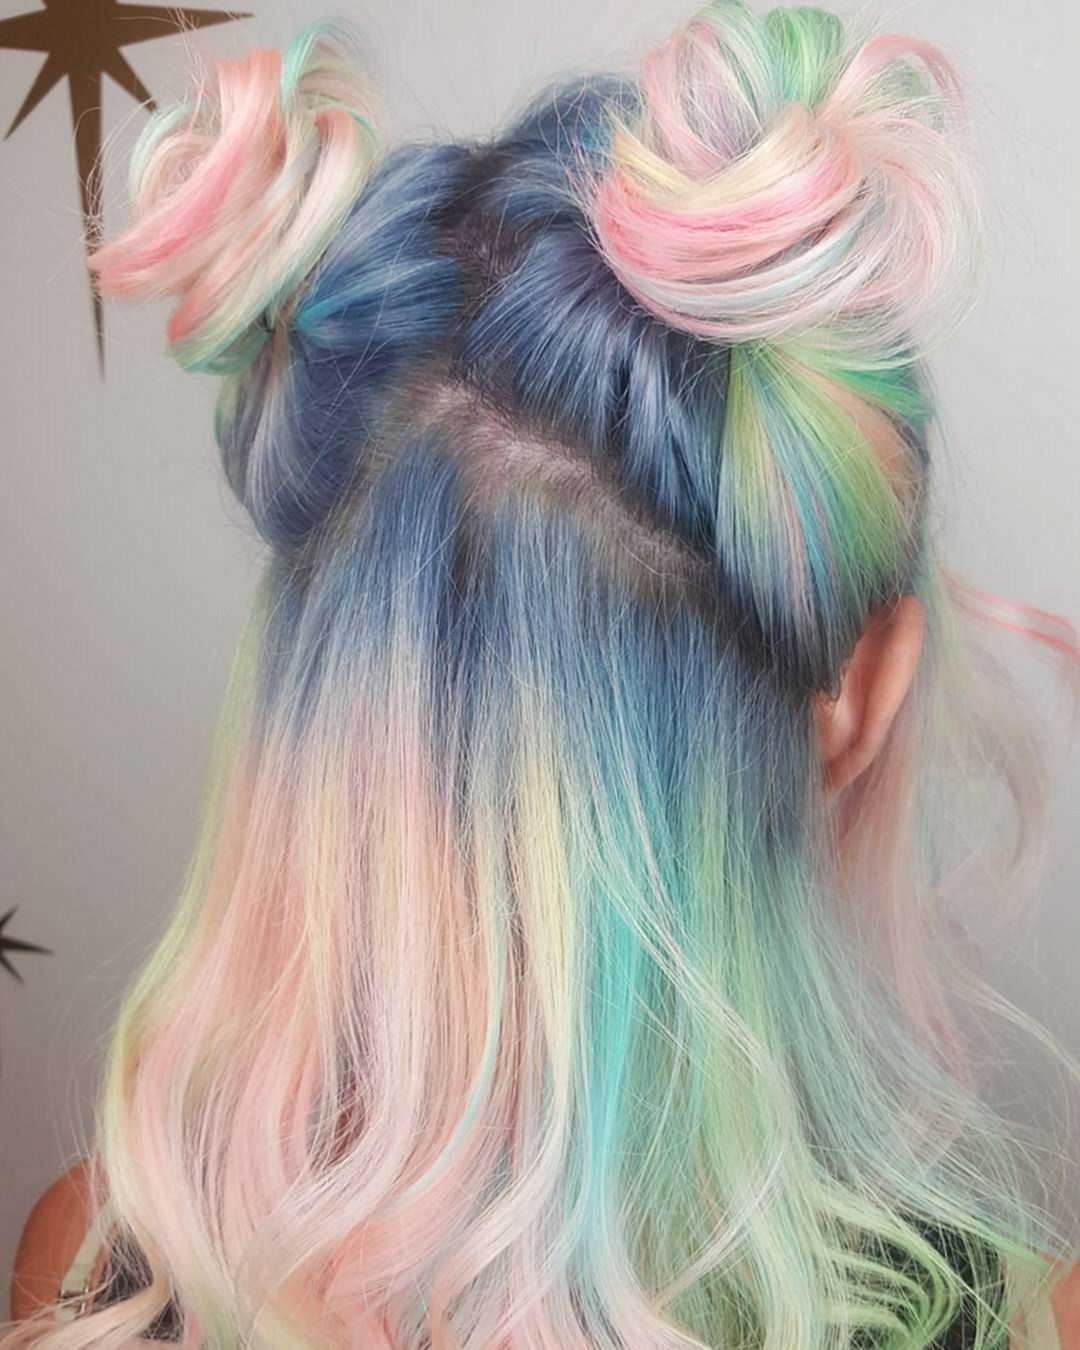 10+ Unique Half And Half Hair Color Ideas For Cute Women